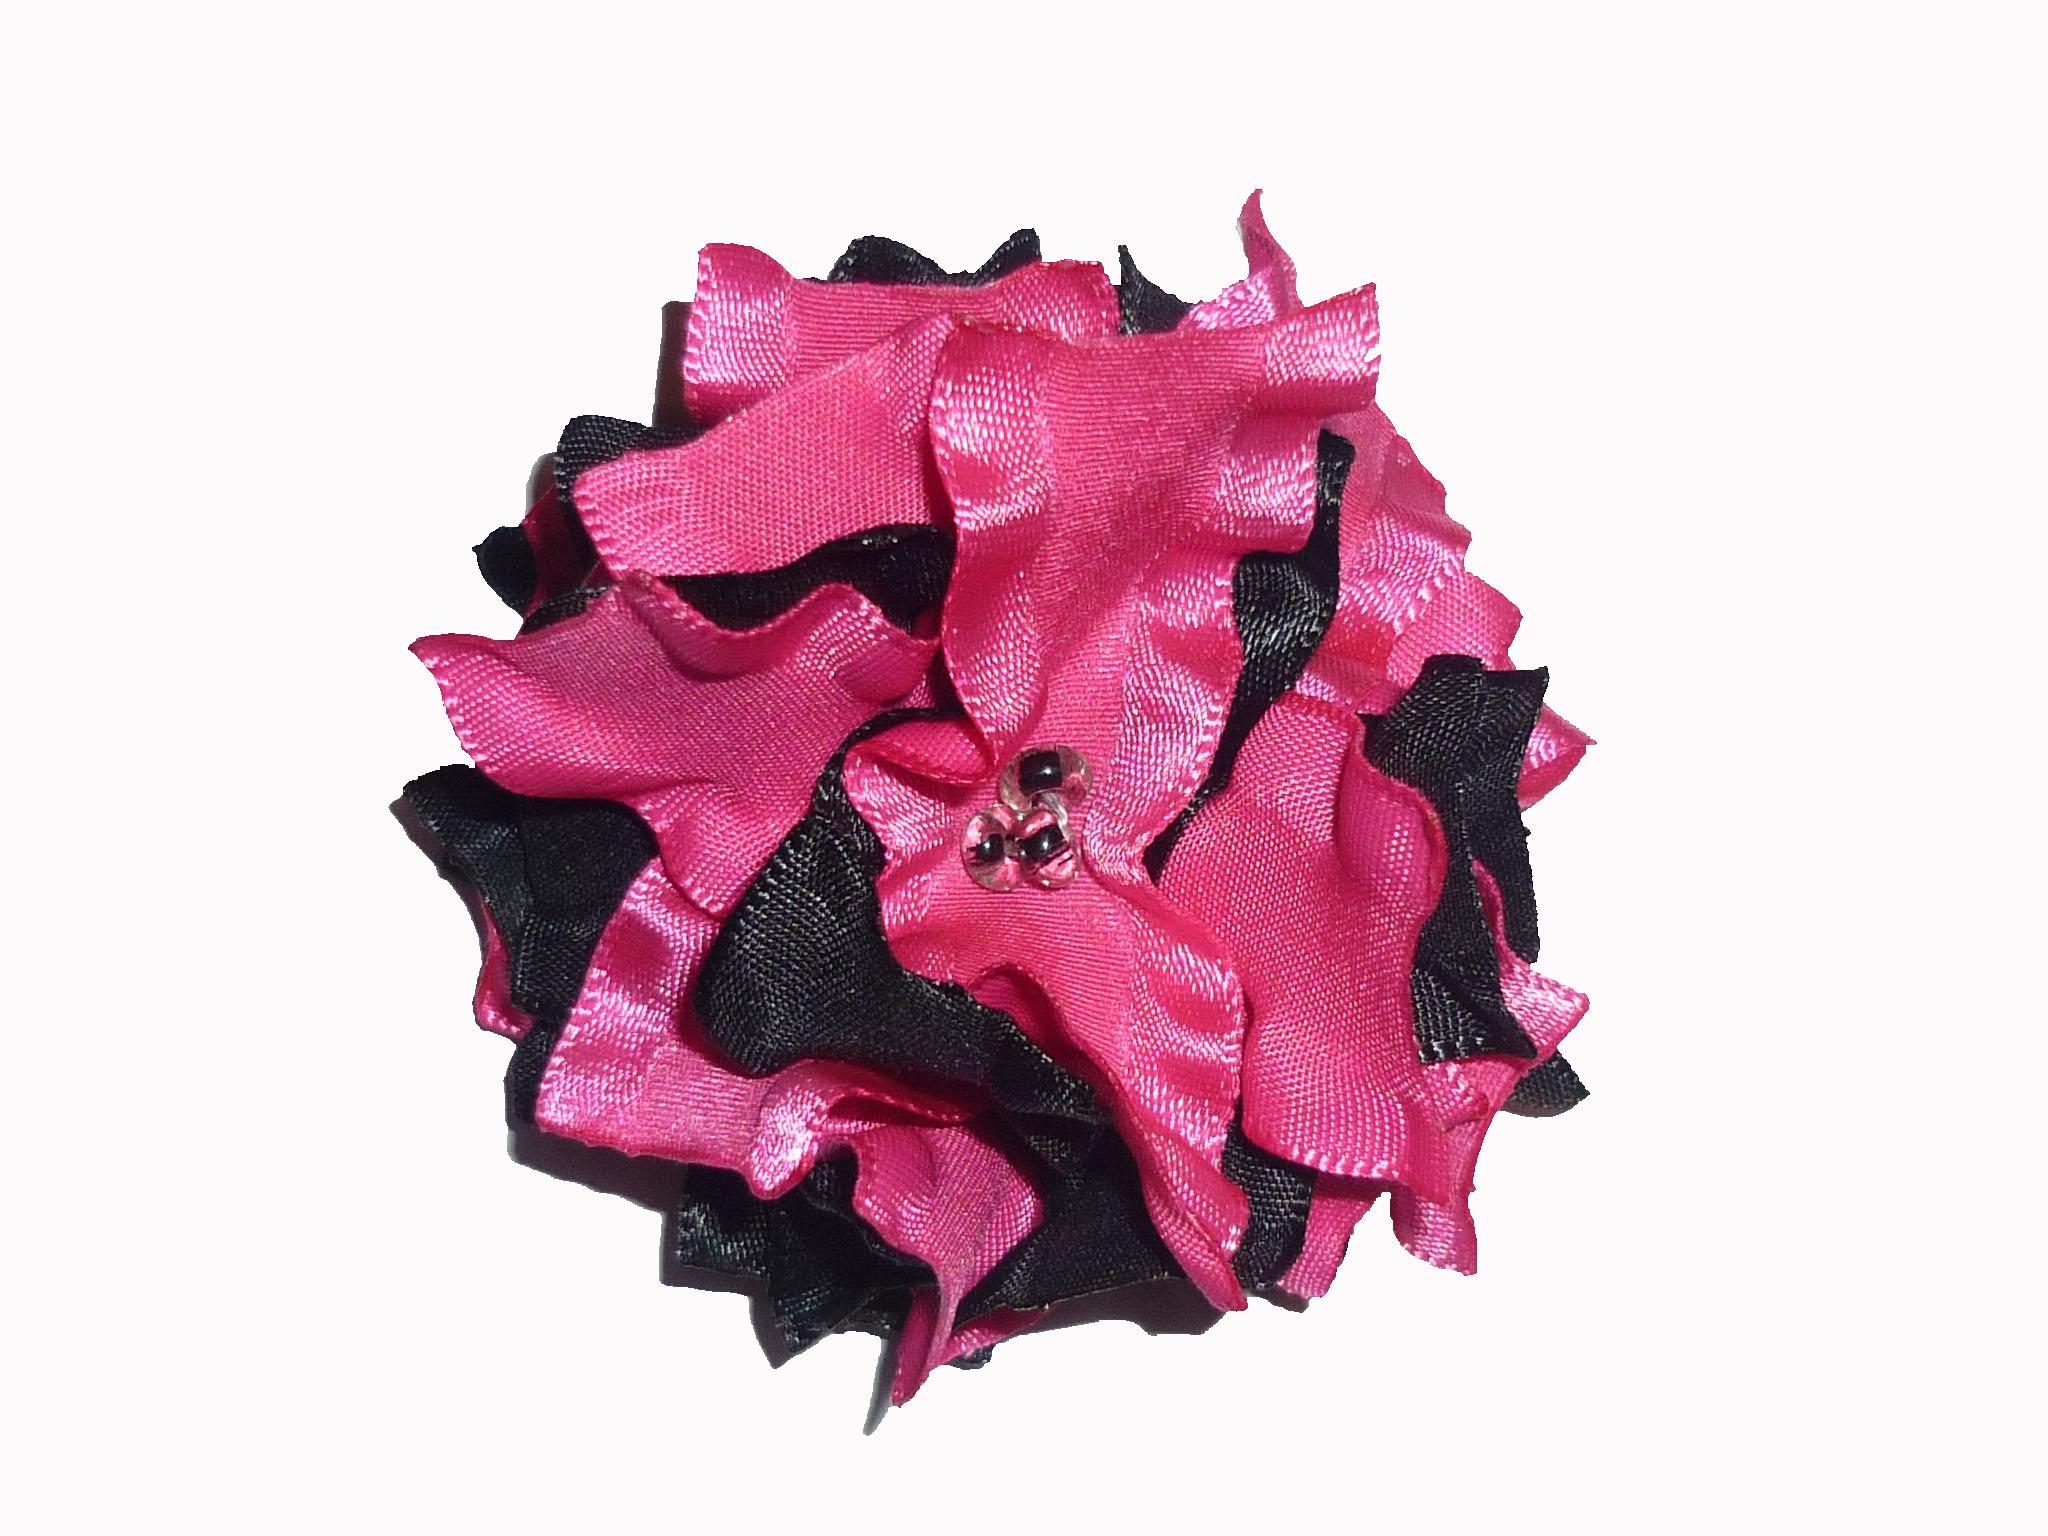 Ruffled Ribbon Flower Hot Pinkblack